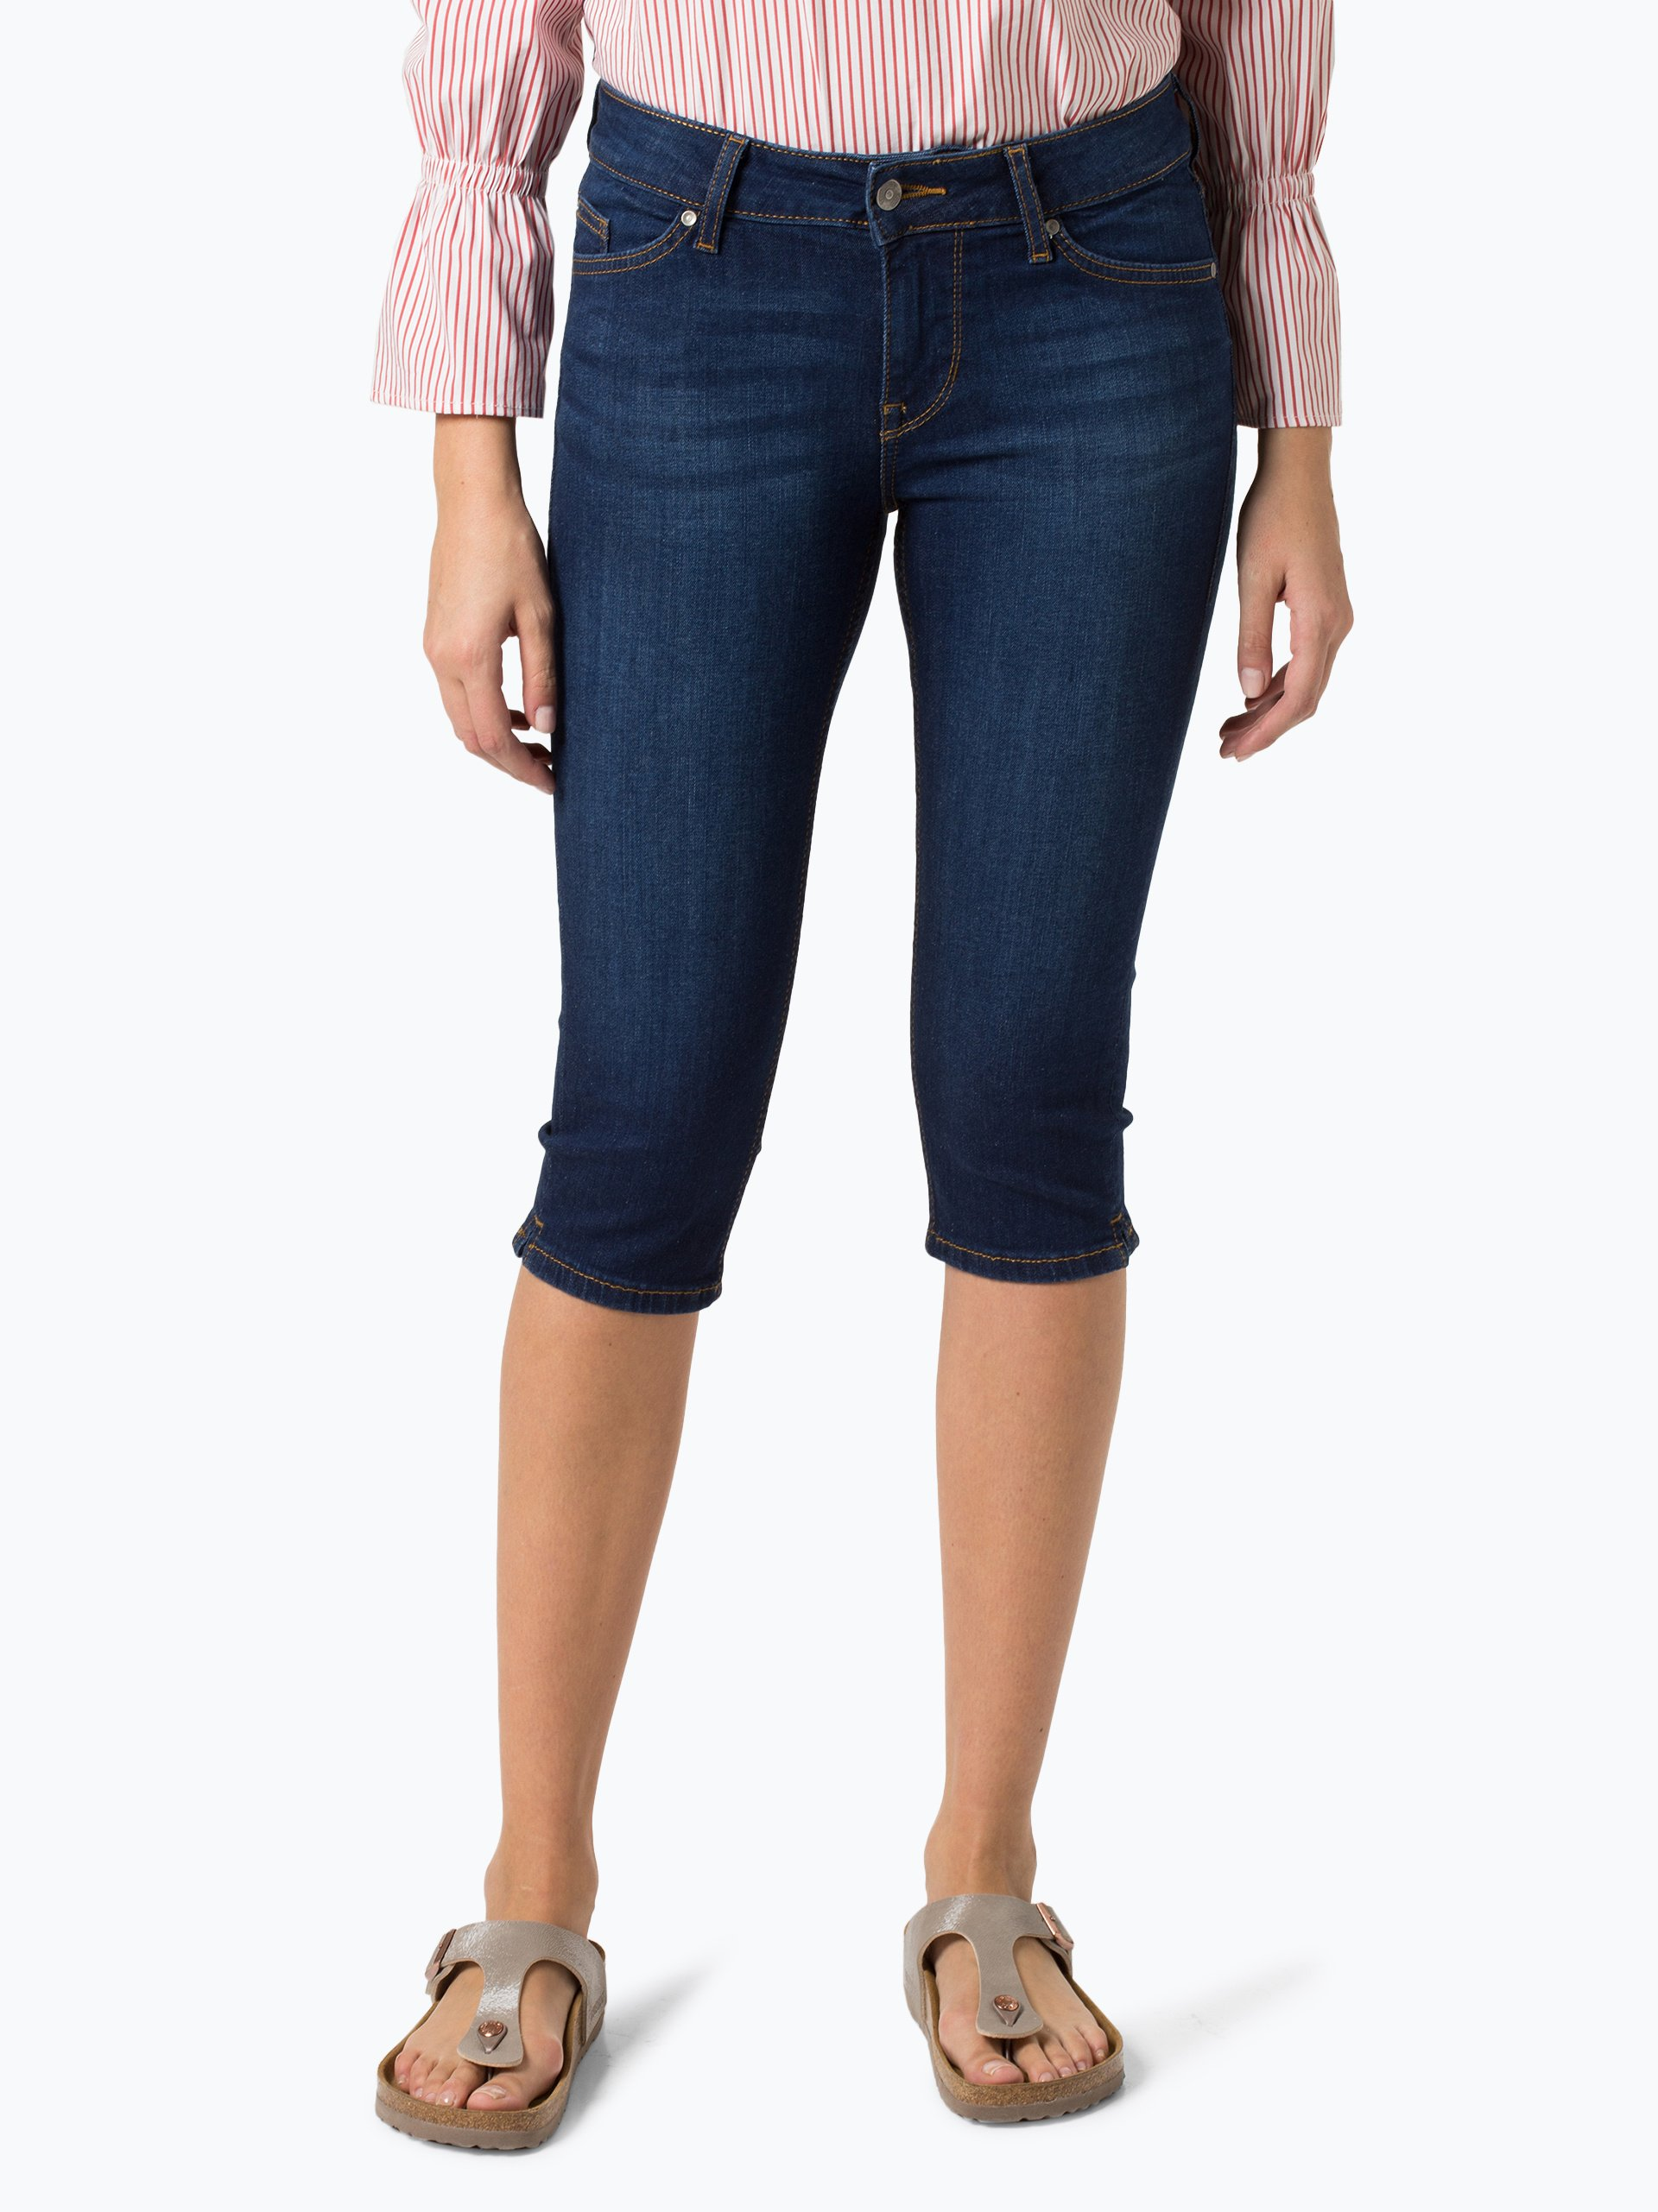 mustang damen jeans jasmin online kaufen vangraaf com. Black Bedroom Furniture Sets. Home Design Ideas